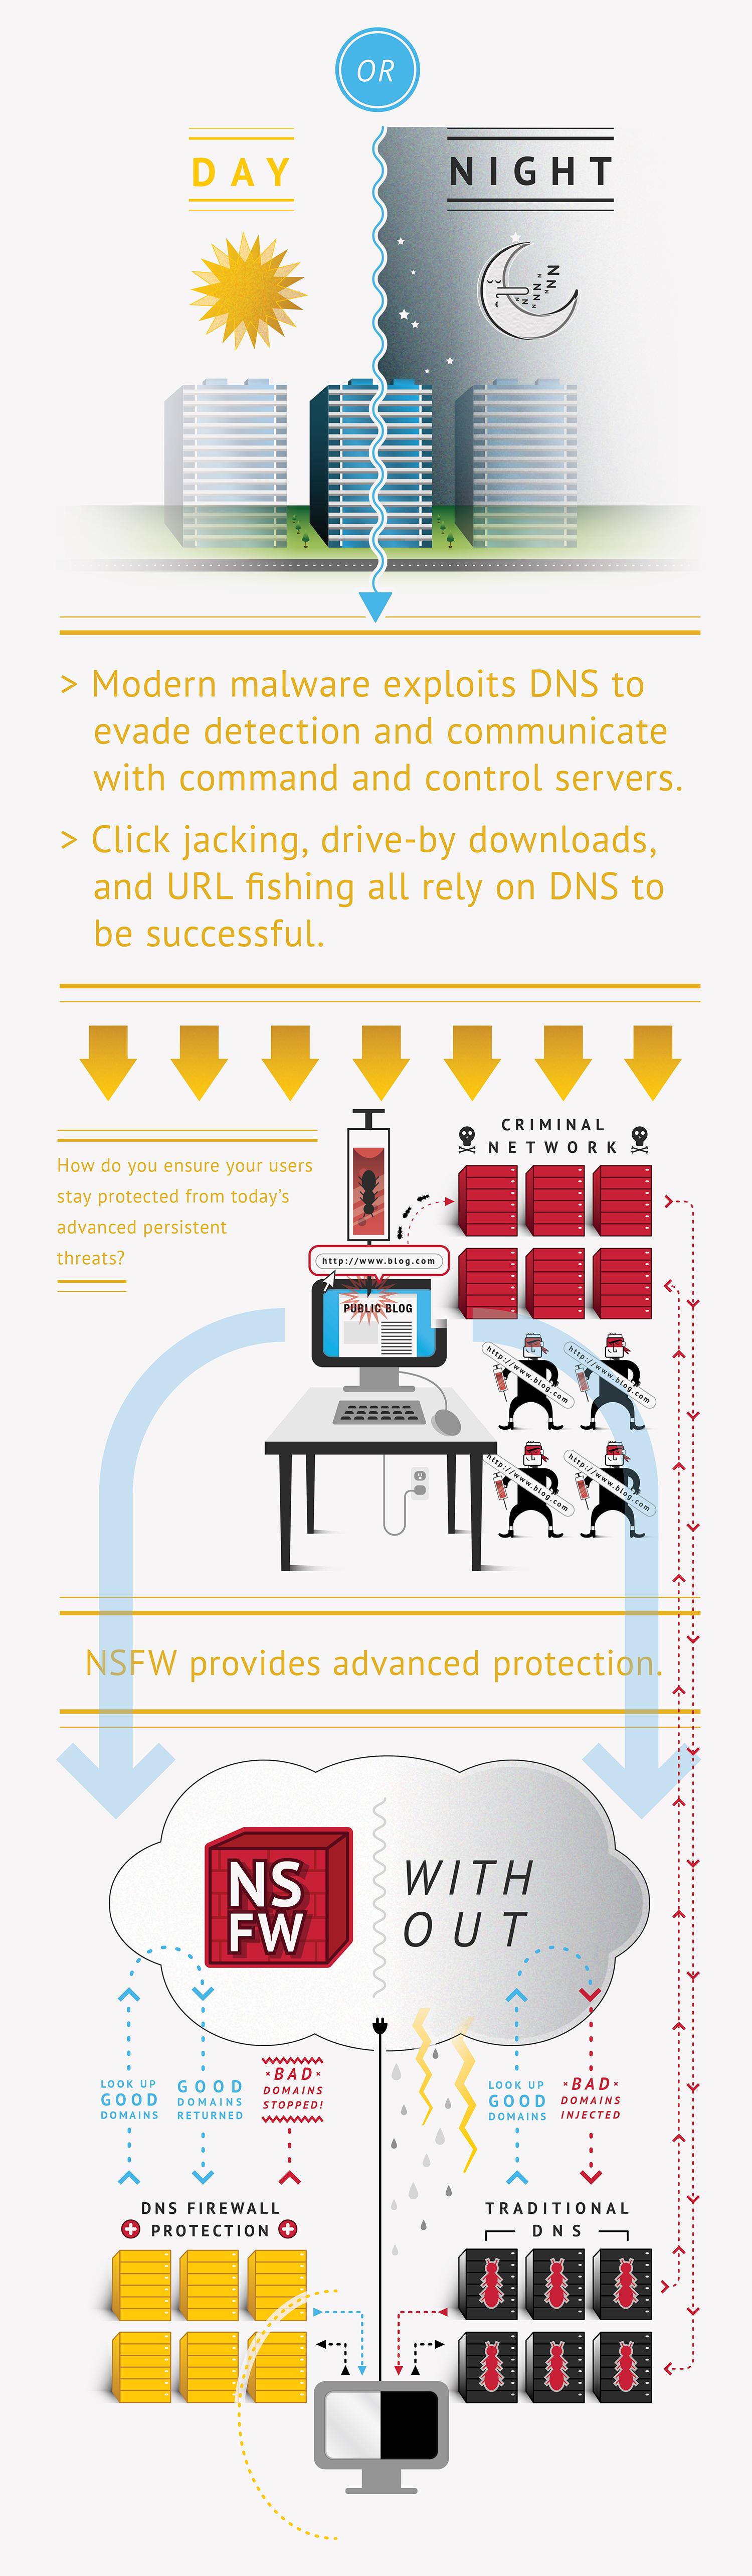 Isystematics-Infographic.jpg